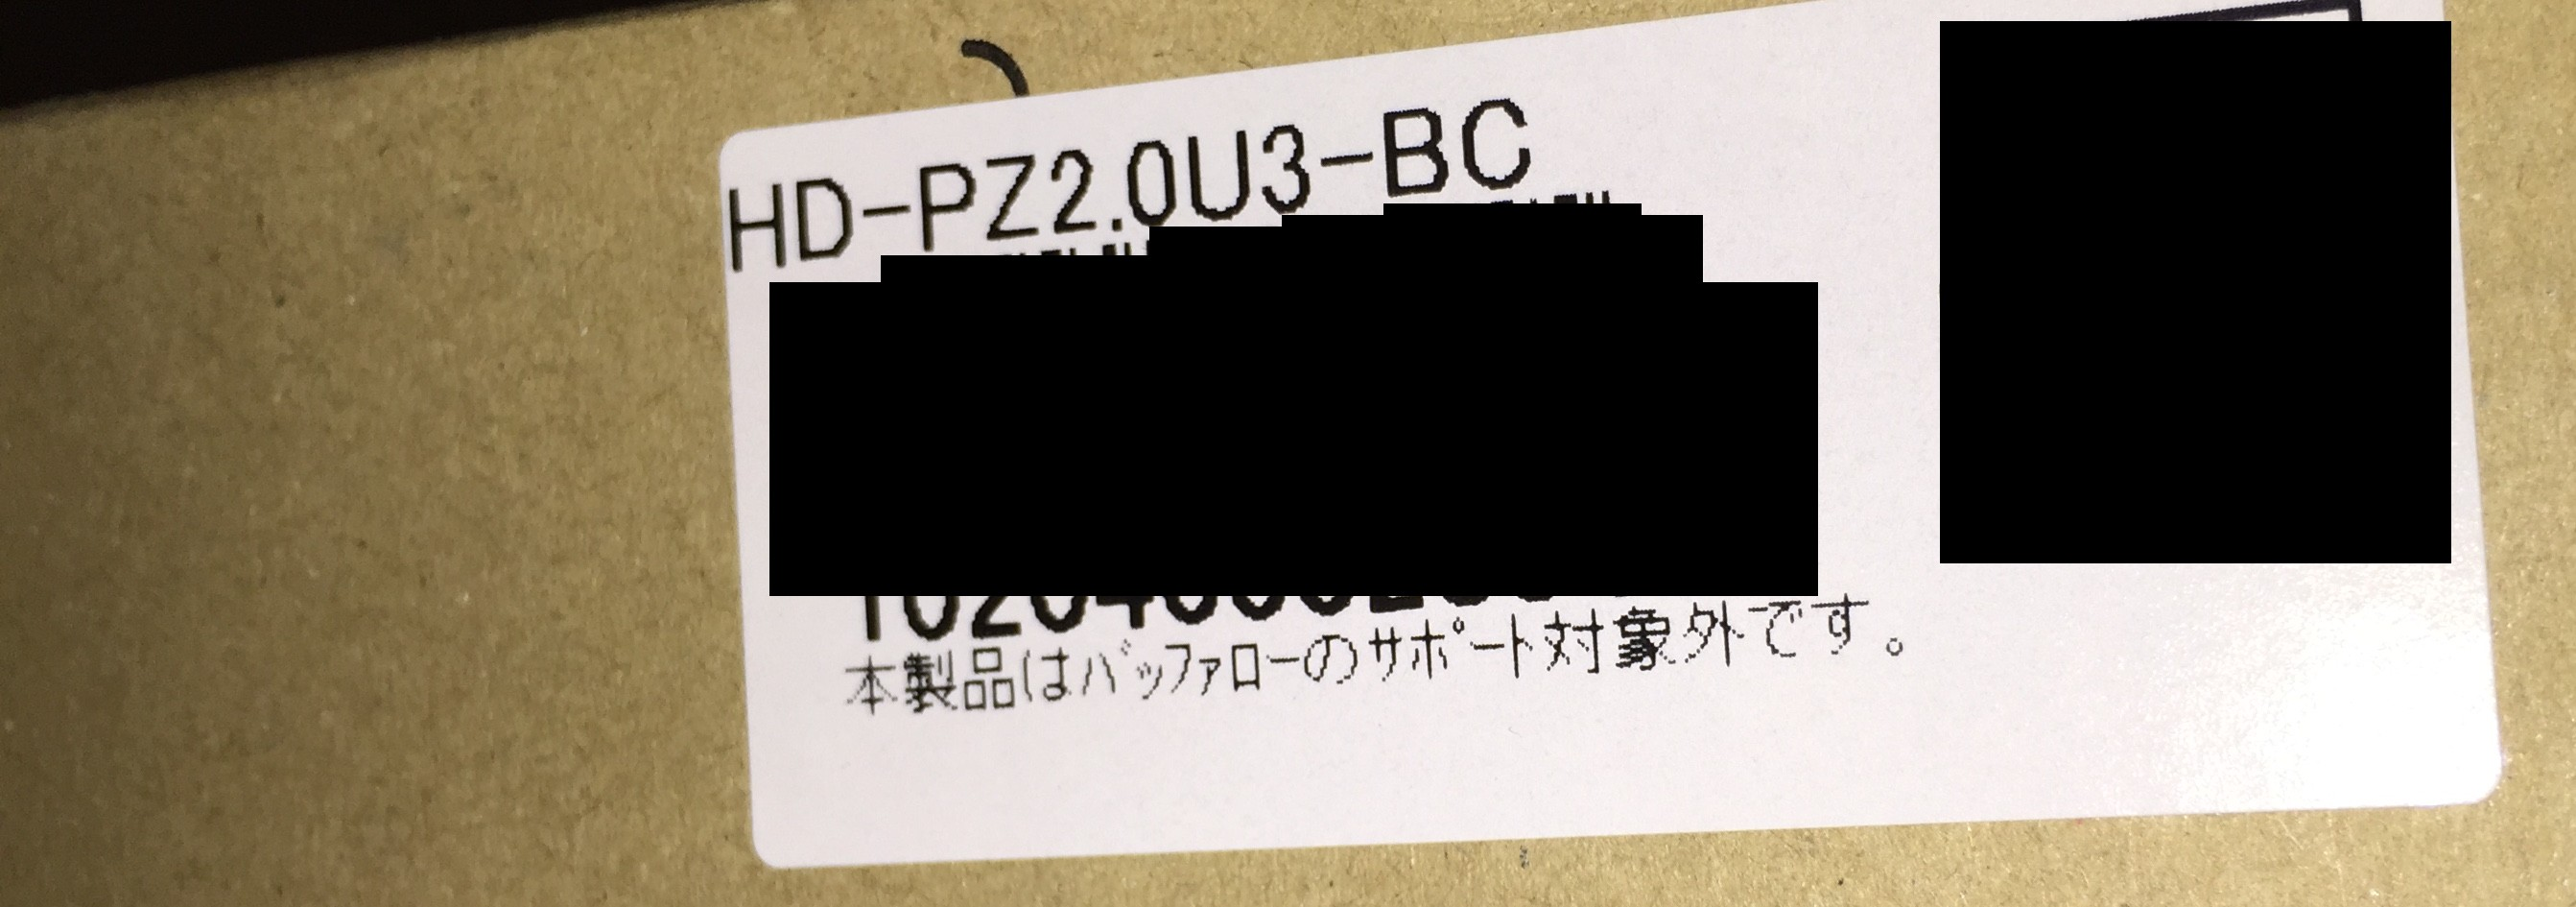 http://konozama.jp/amazon_devil/photo/konpo.jpg